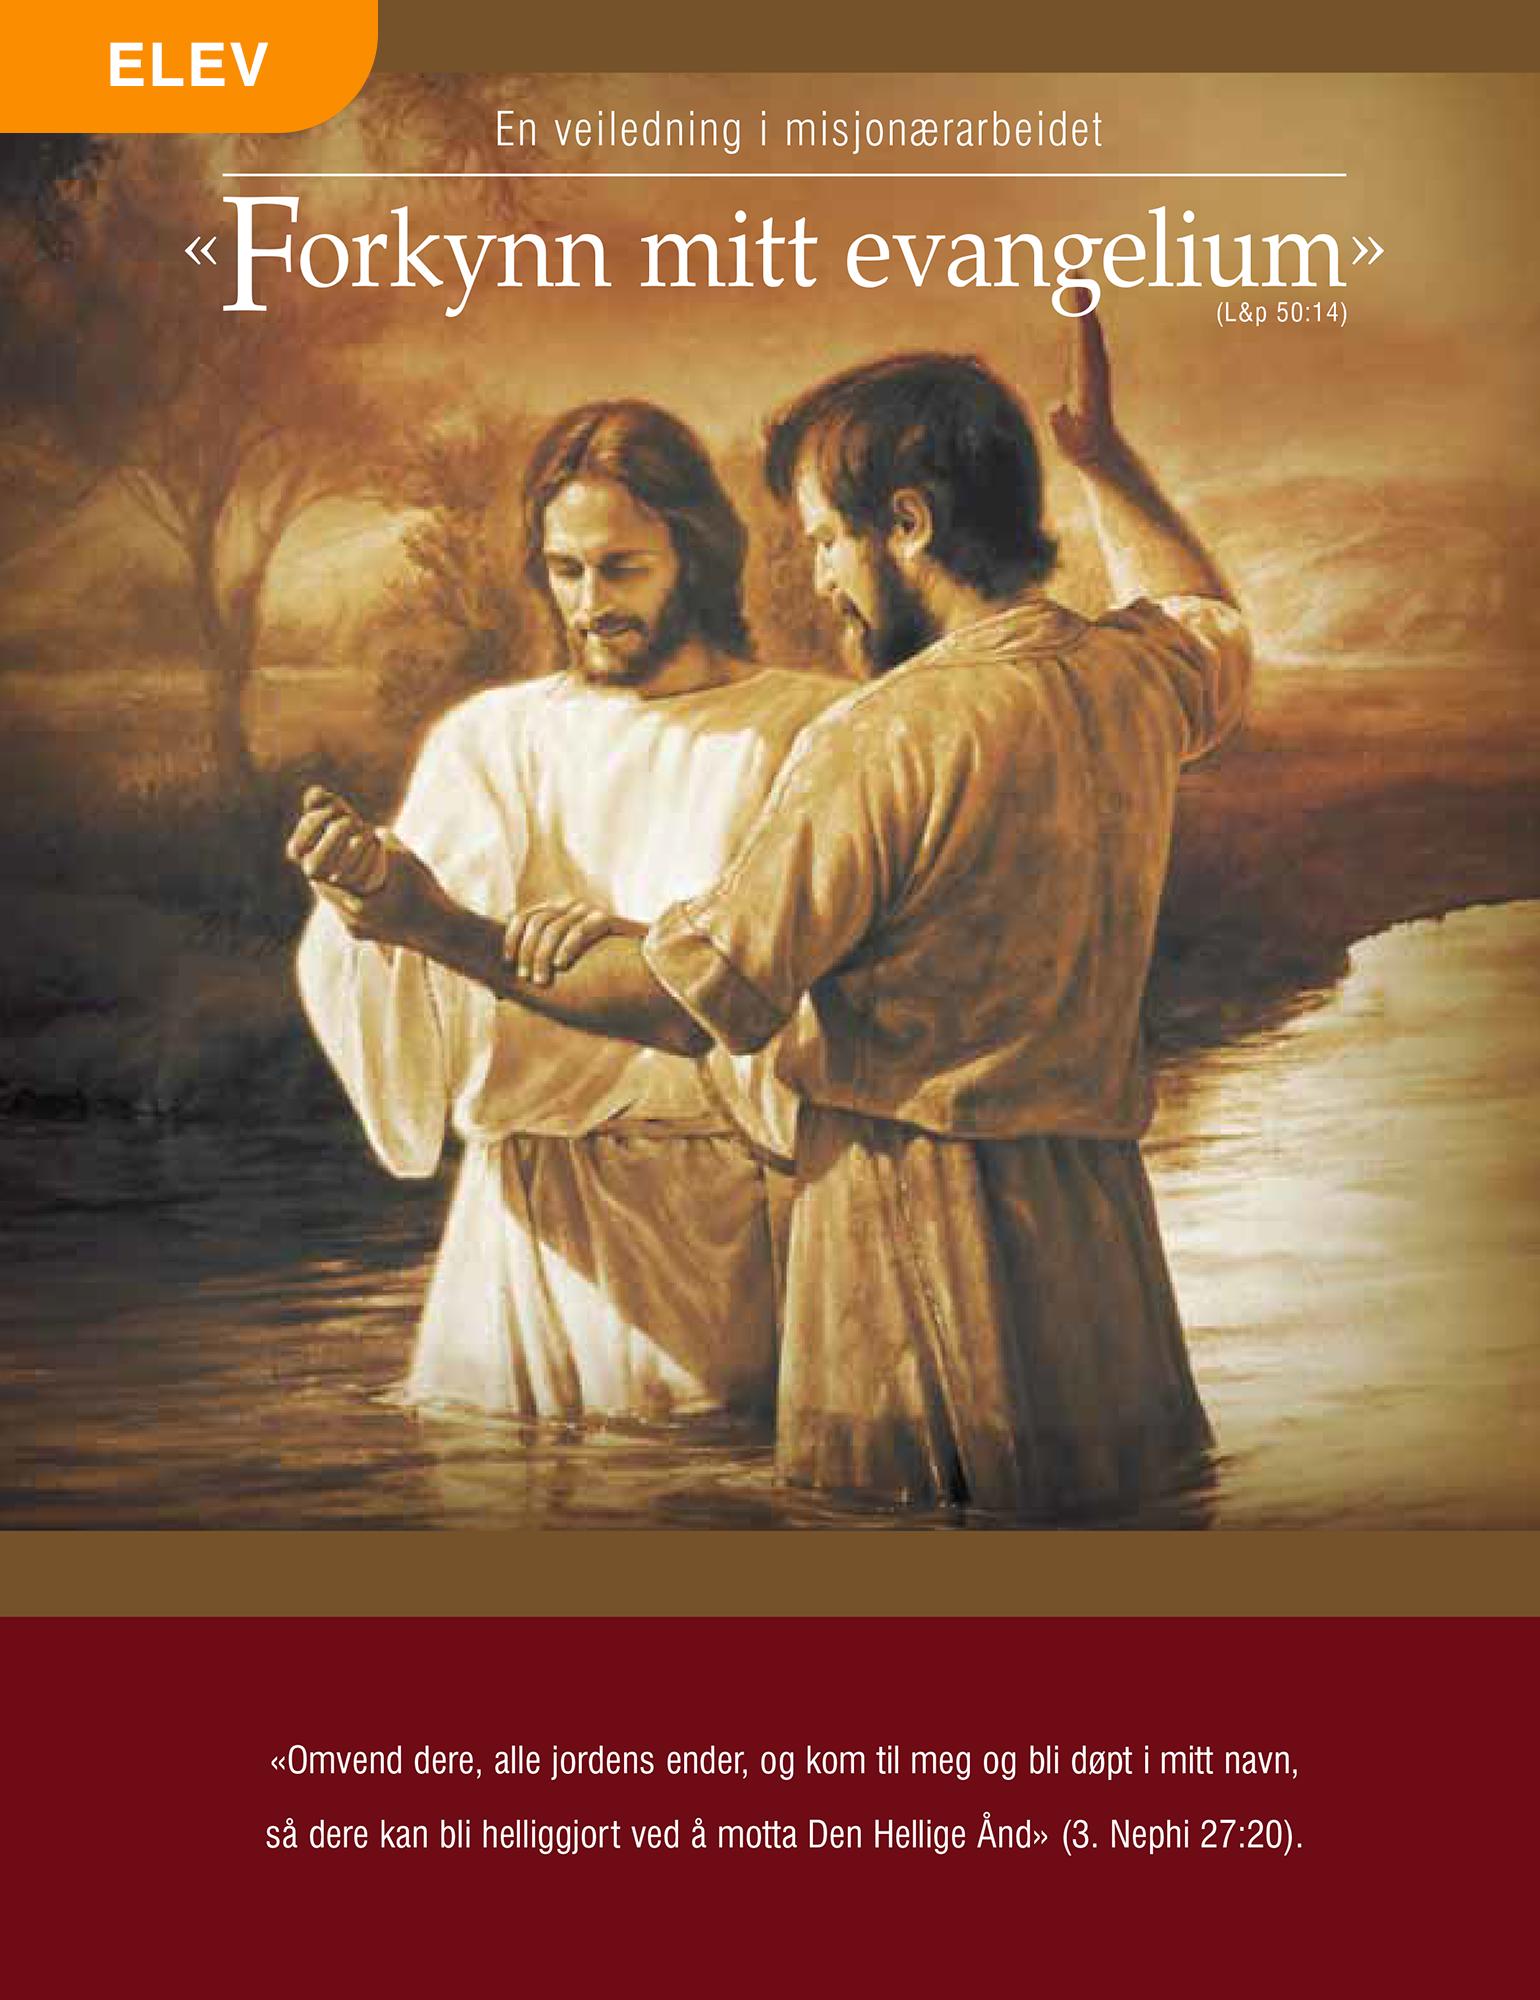 Forkynn mitt evangelium